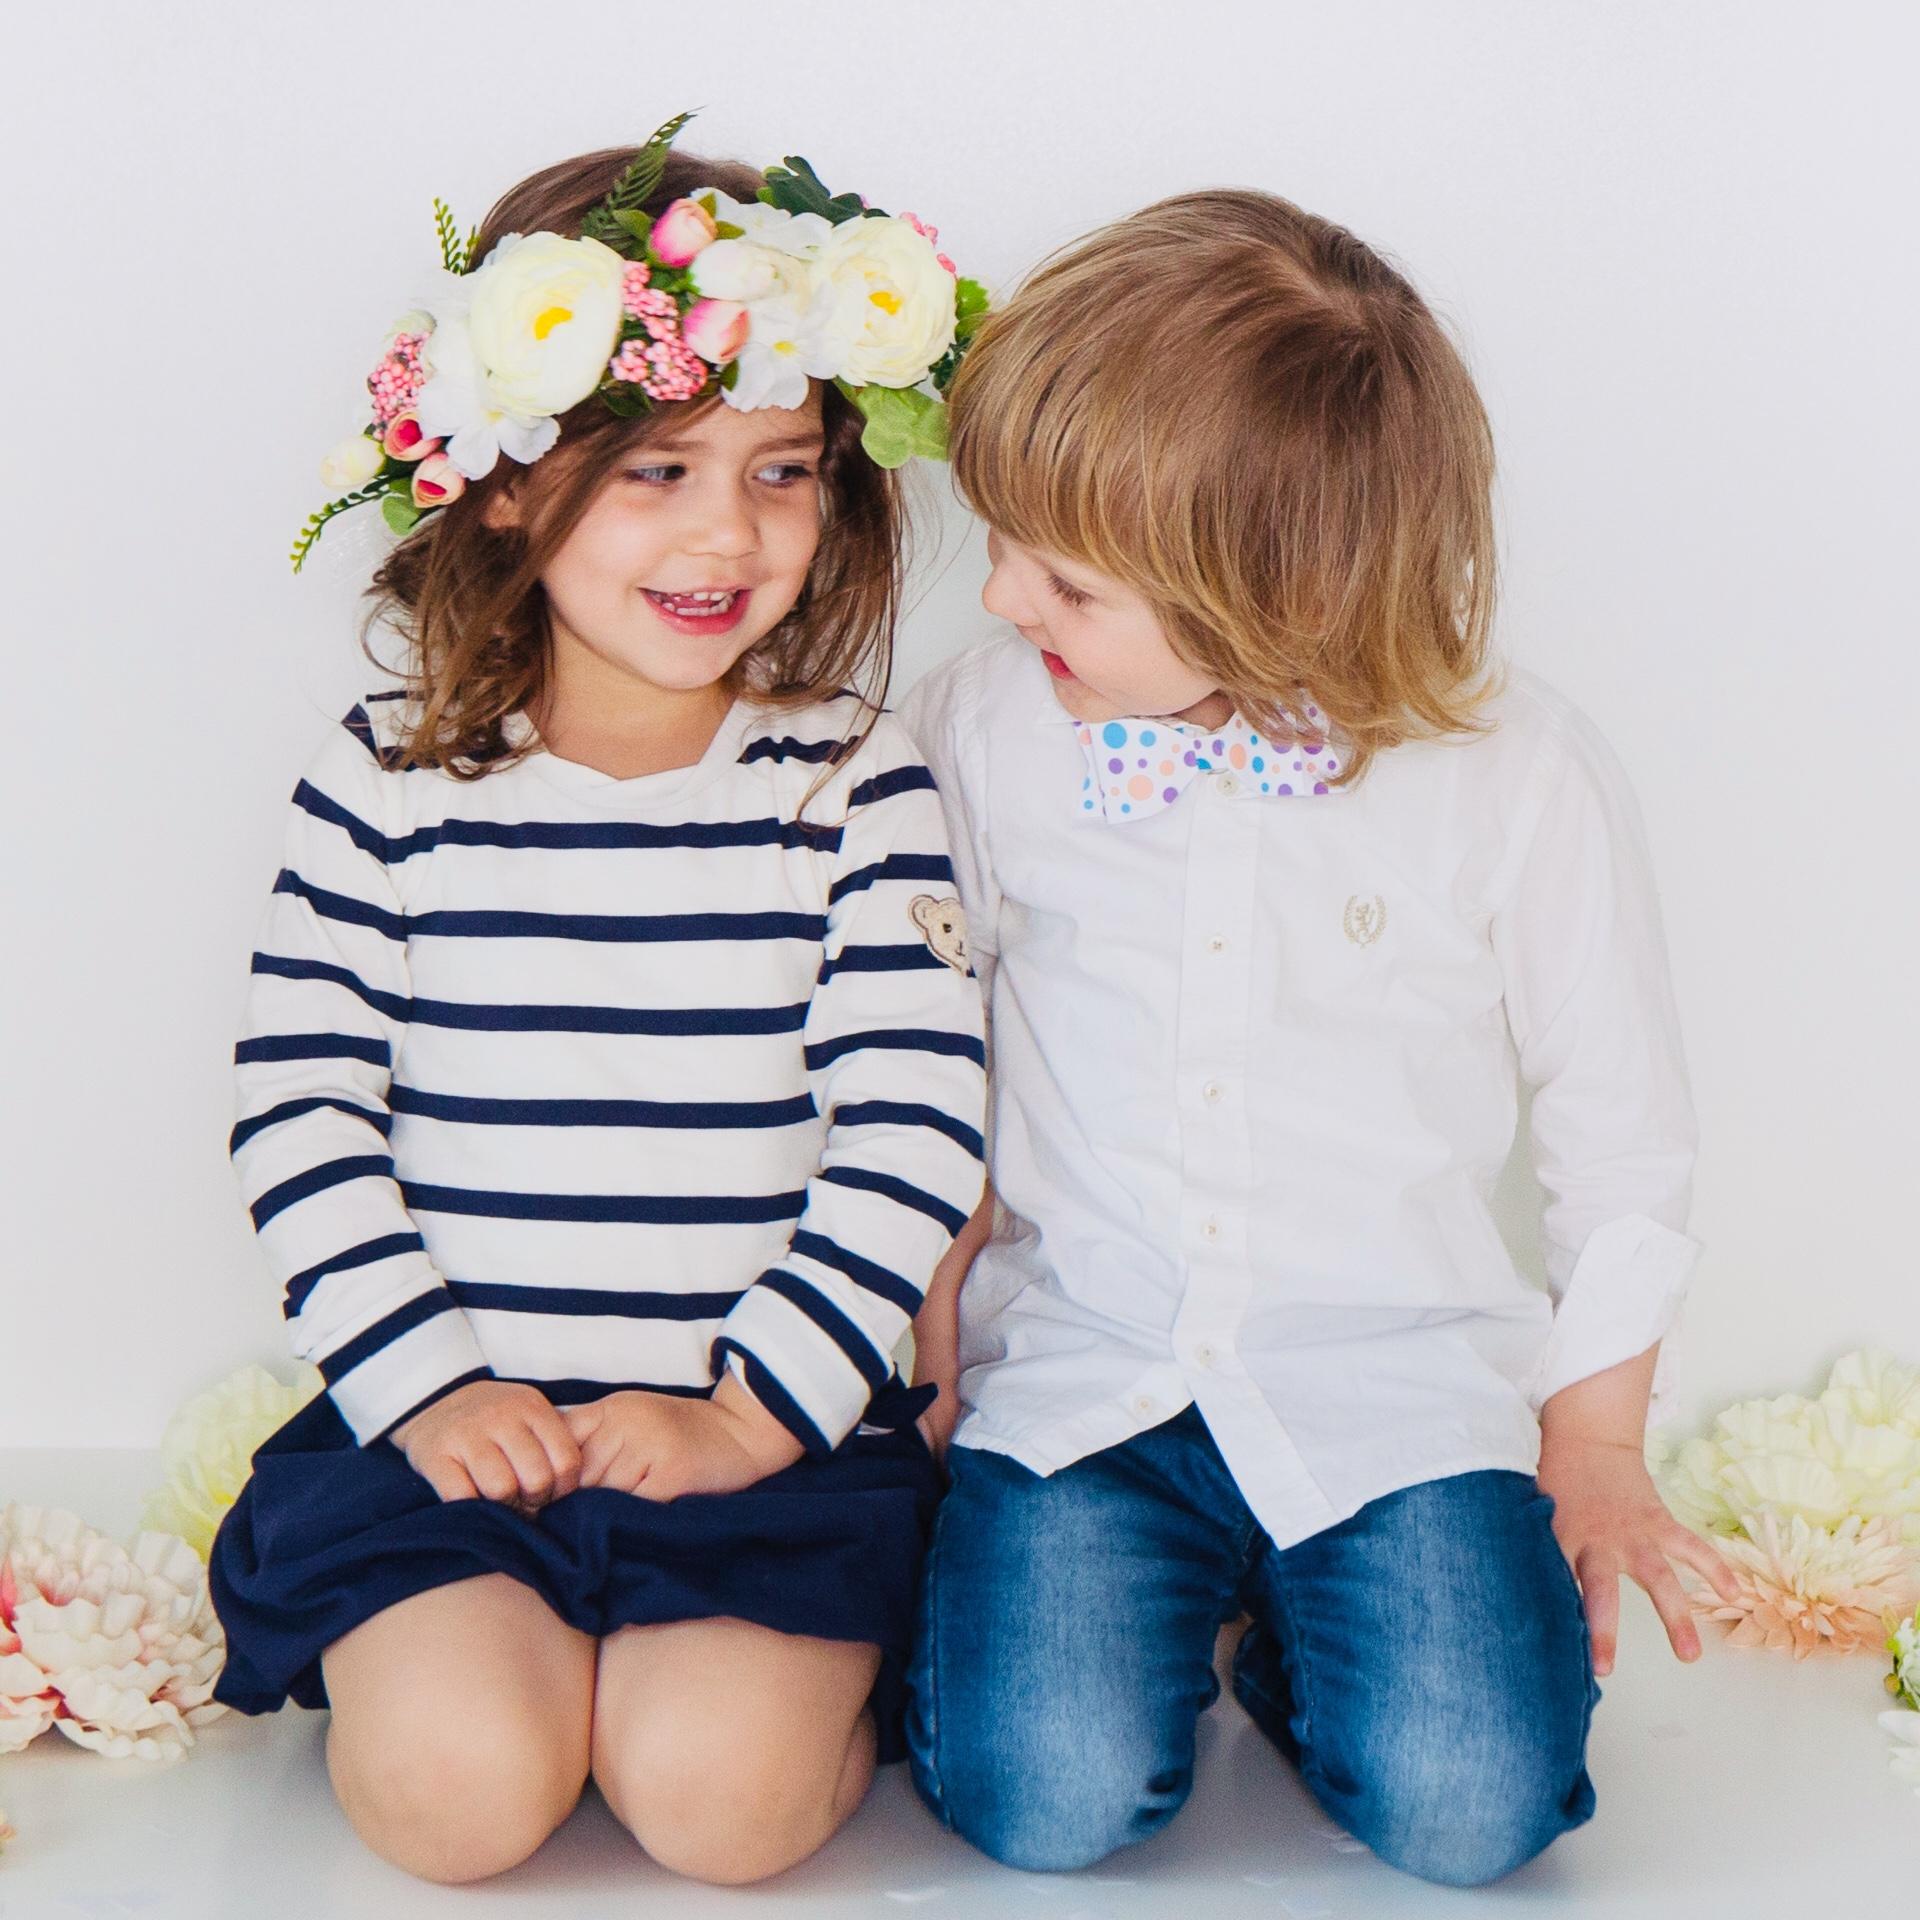 galerie-littleboxes-07-kindergartenfotografie